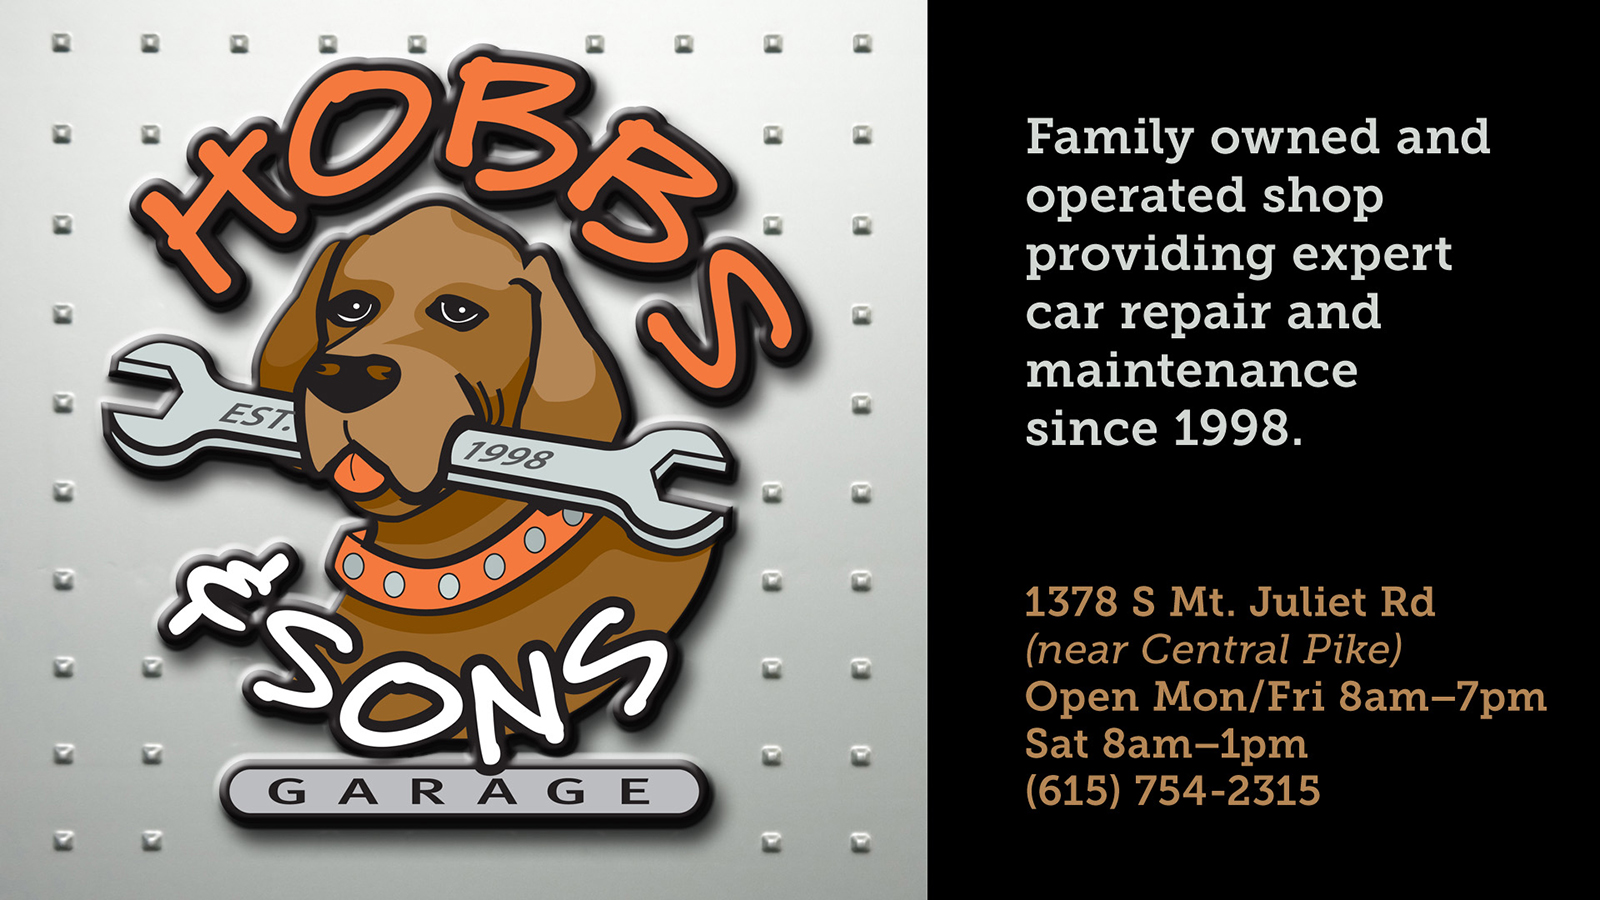 Hobbs & Sons Garage